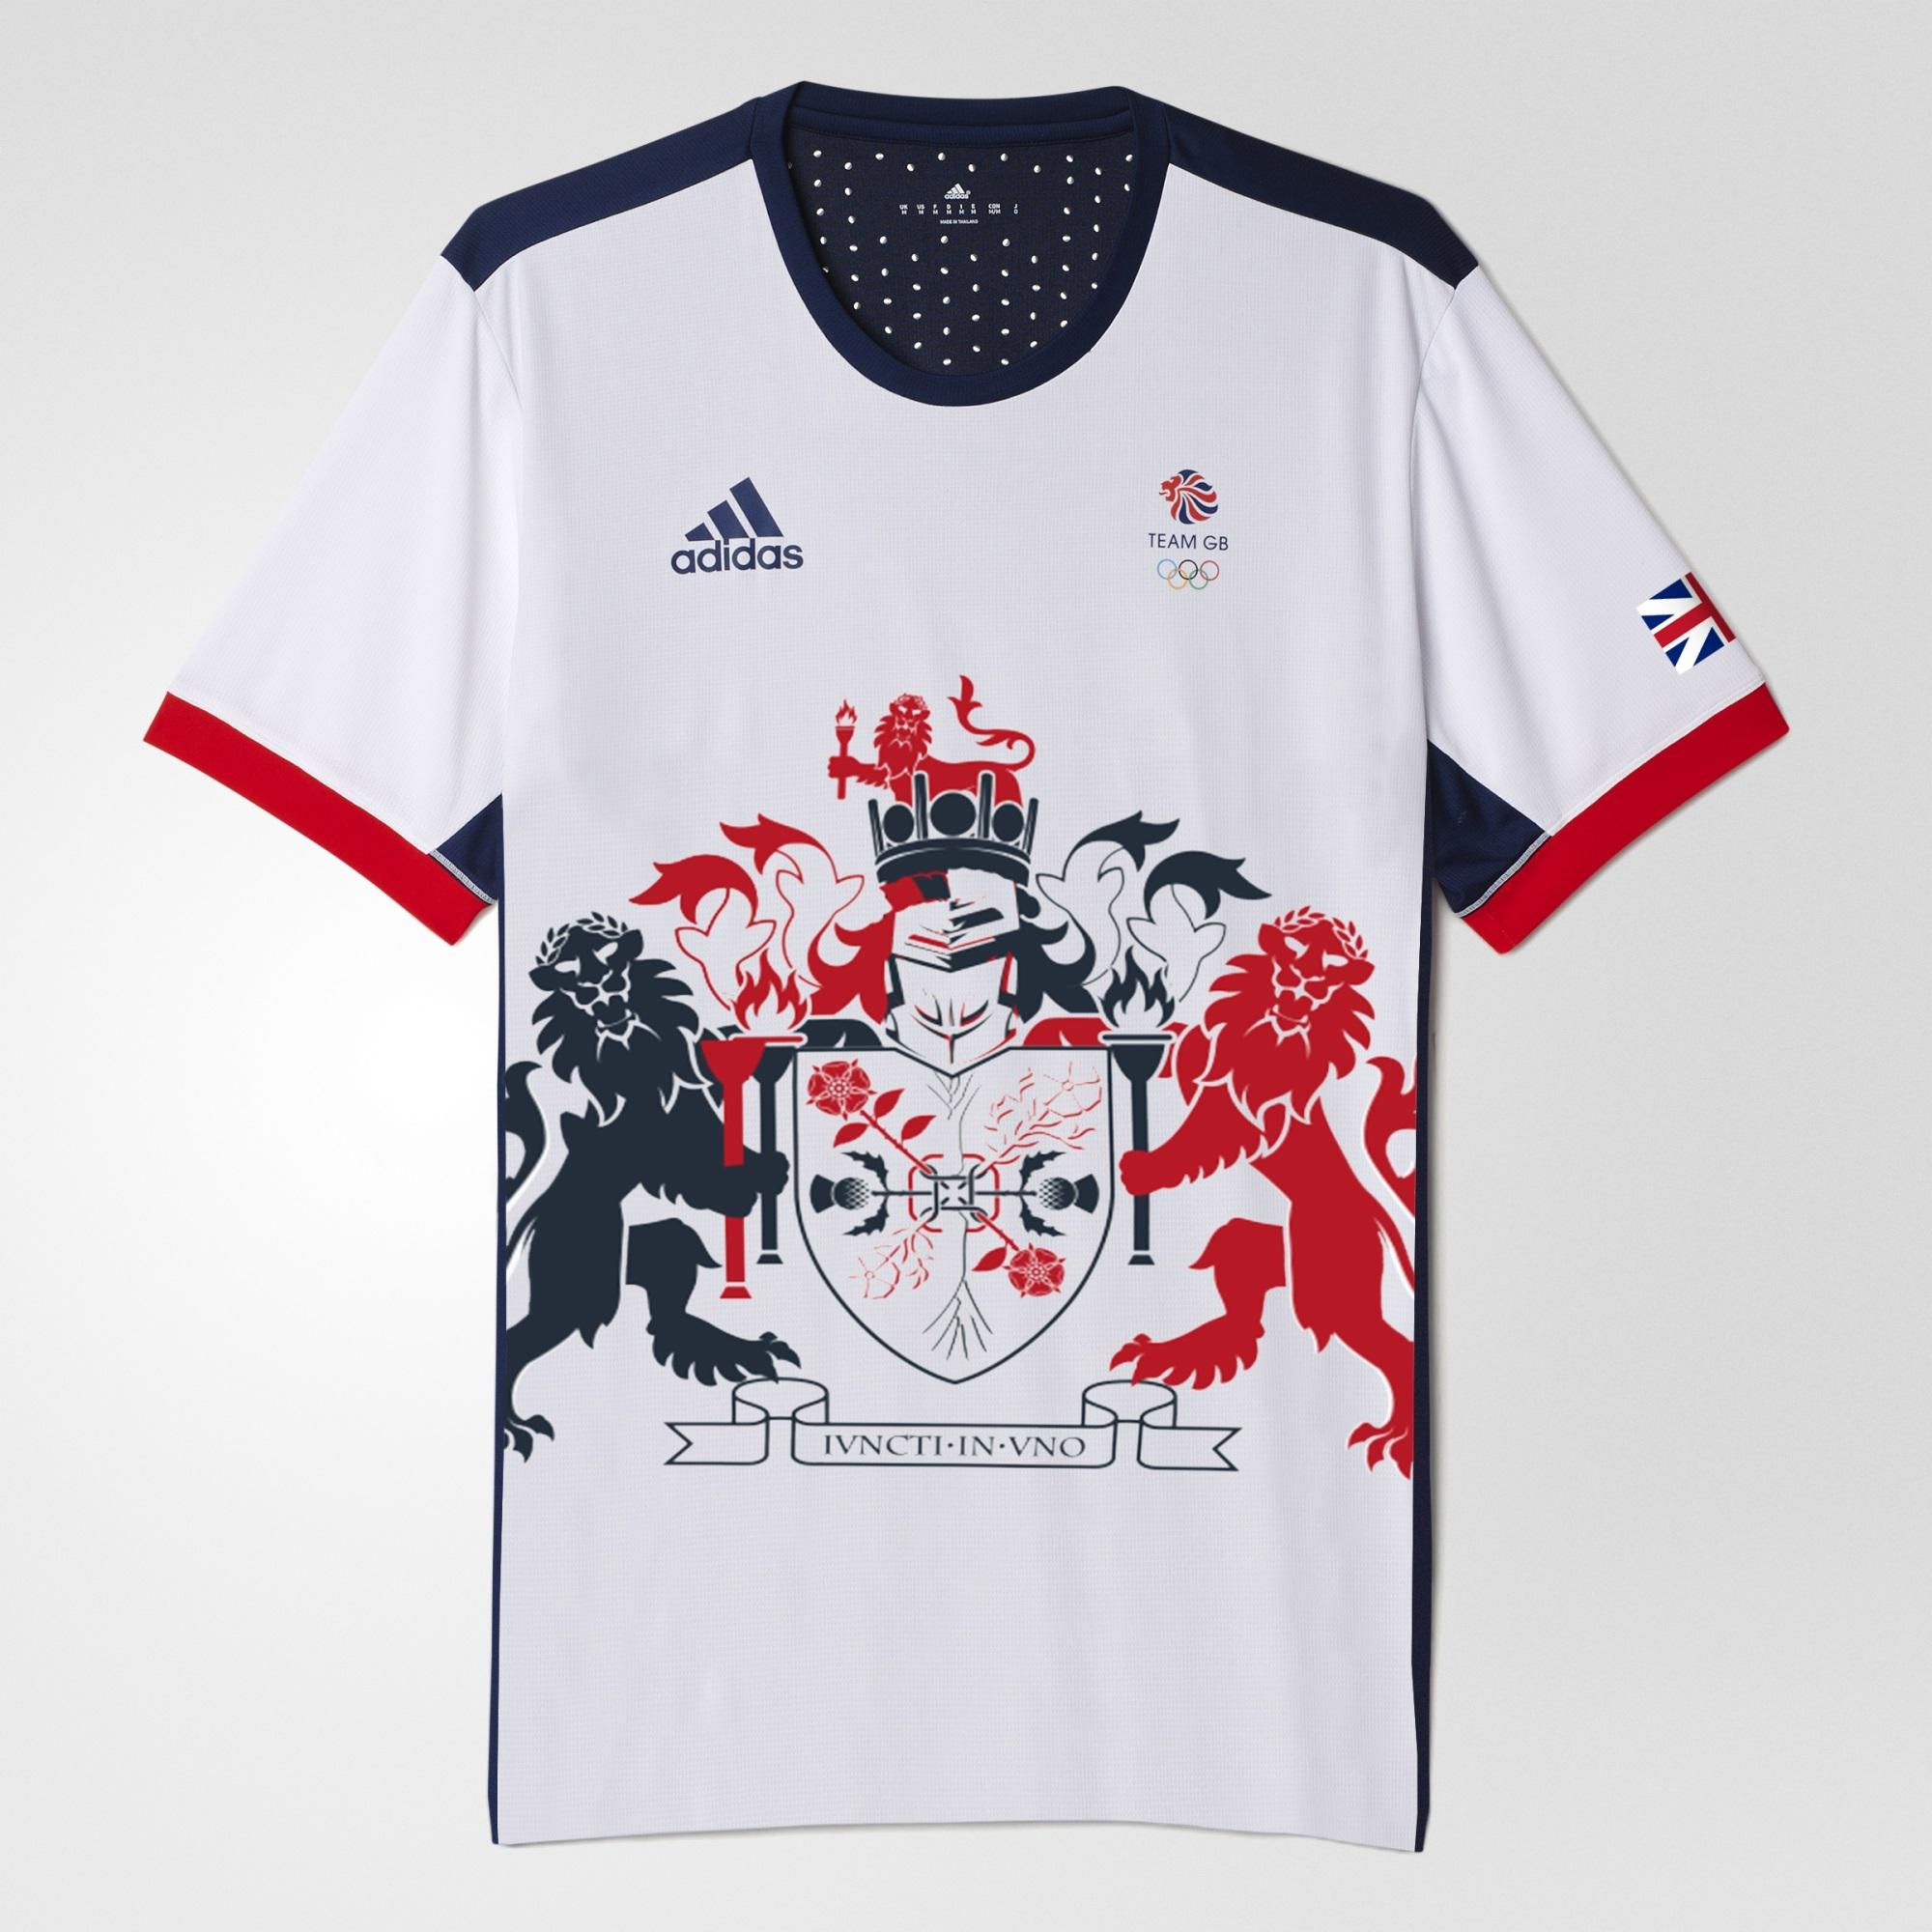 Adidas Mens Rio 2016 Team GB Olympic Climachill Tee - White/Blue -  Tennisnuts.com